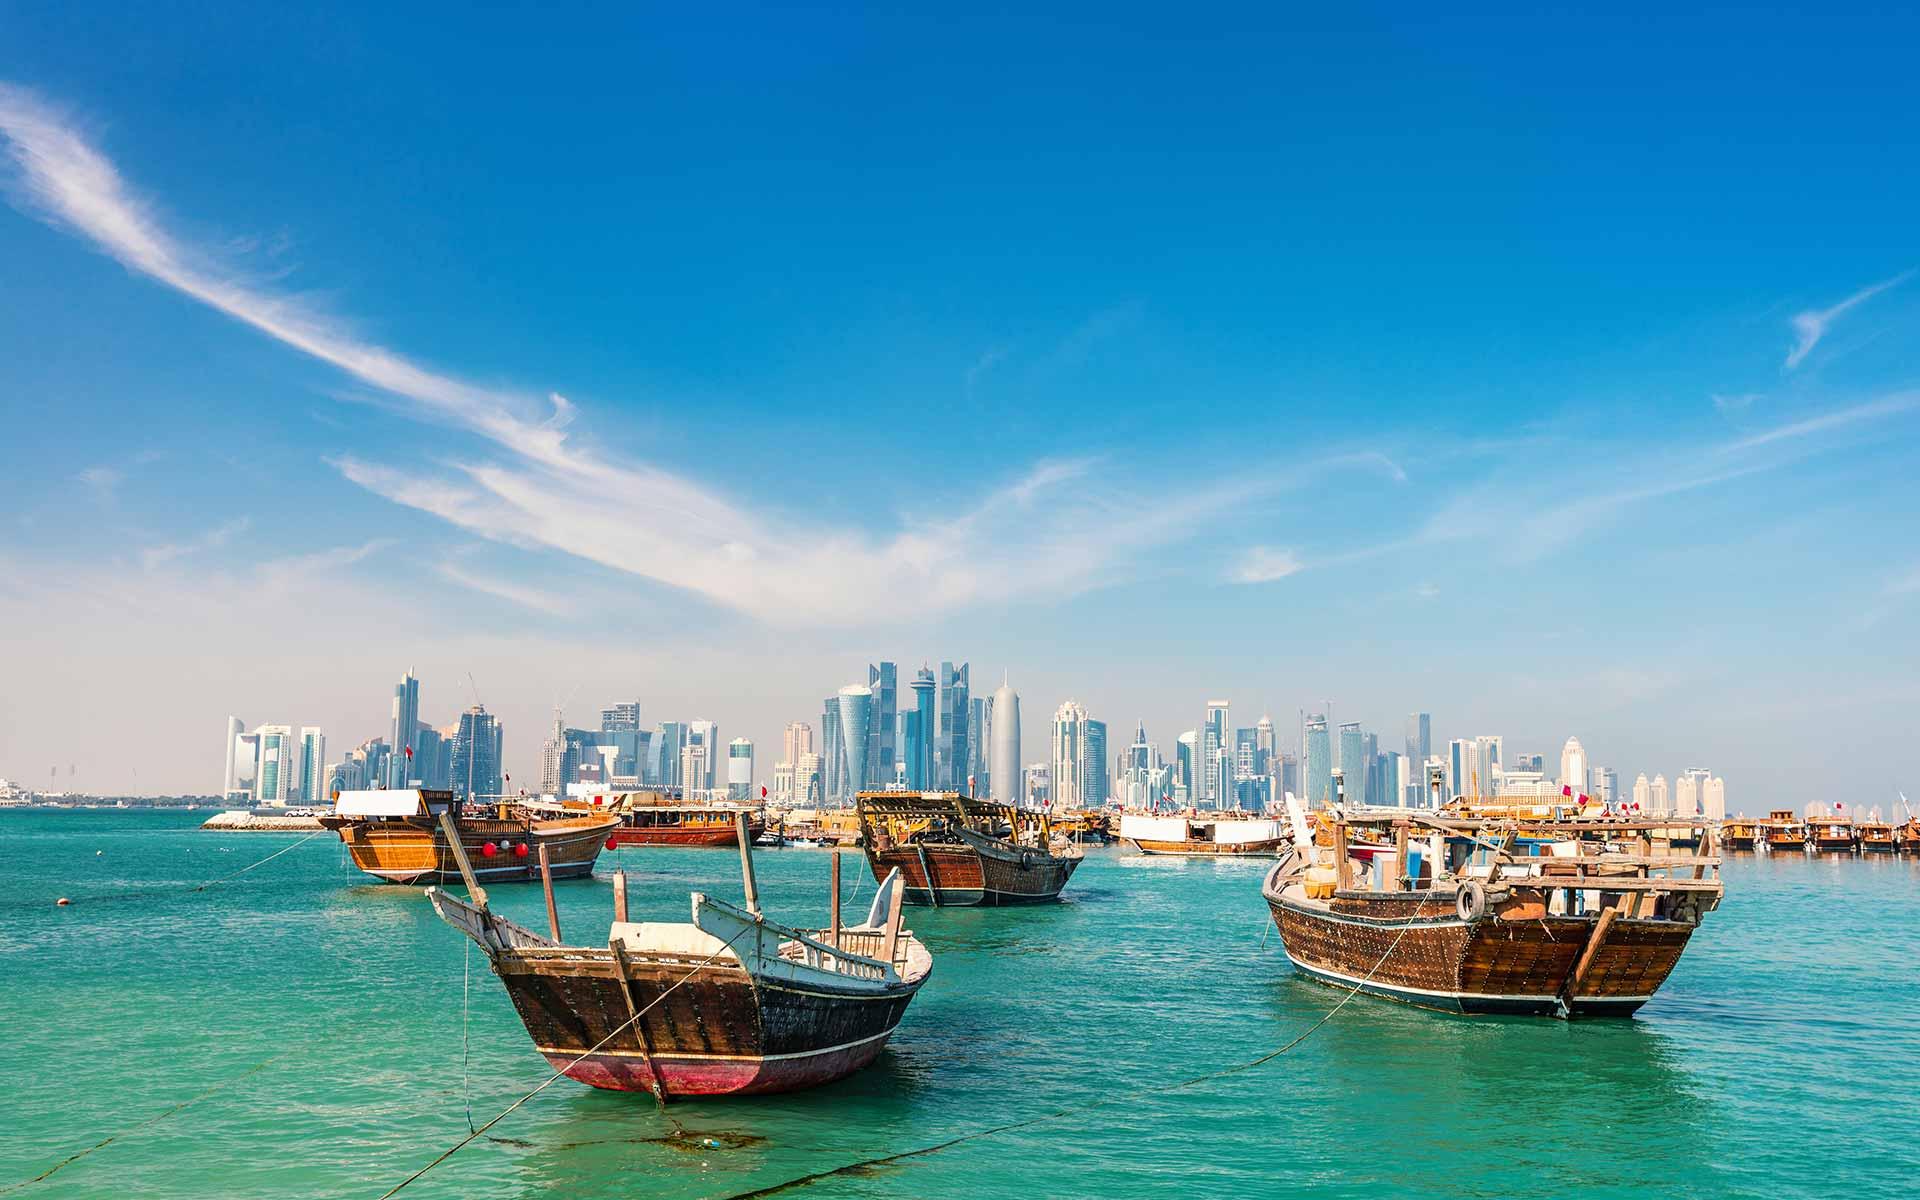 Katar Wasserblick